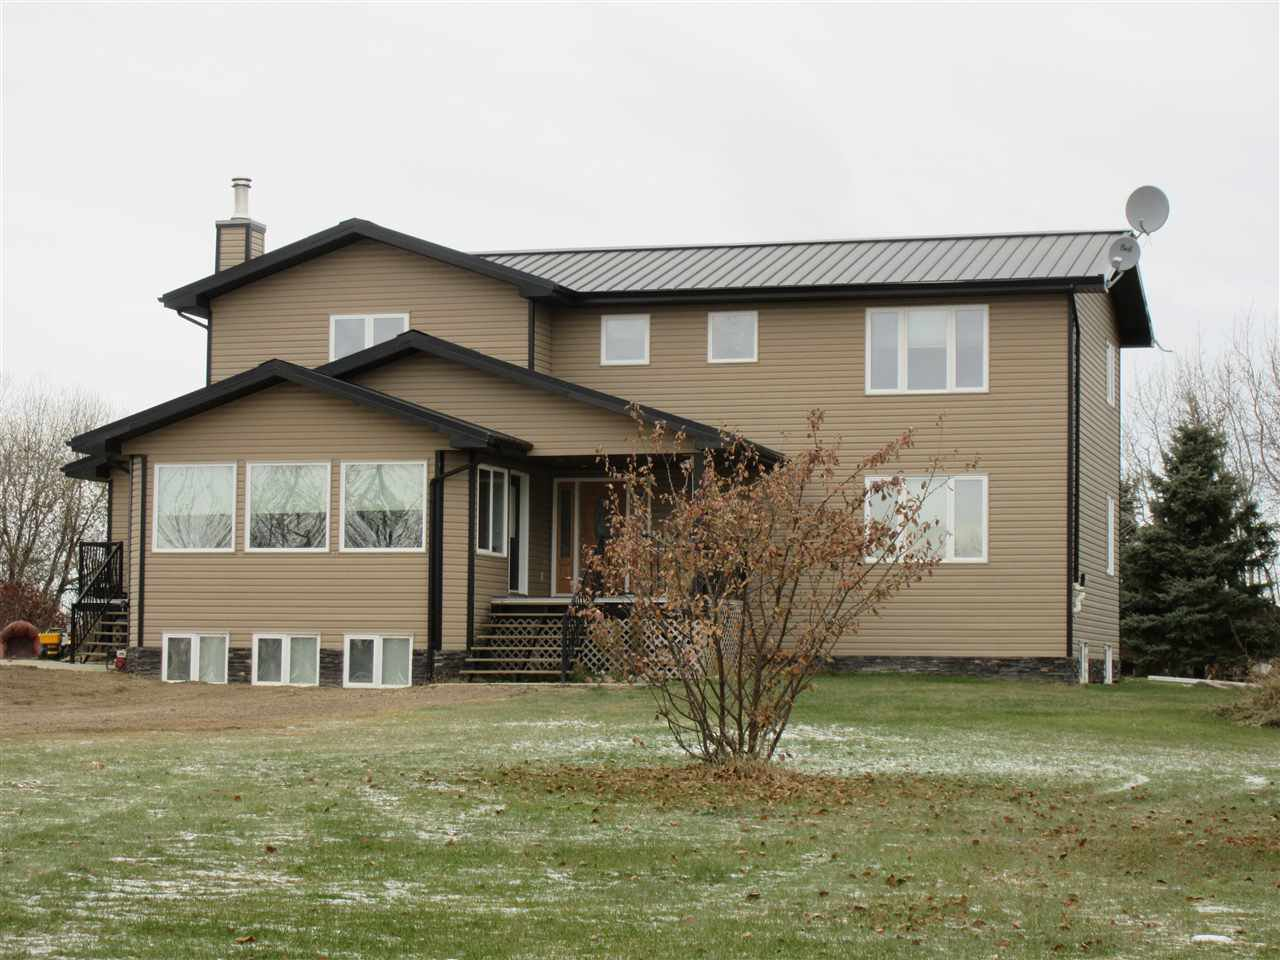 Main Photo: 60320 RR205: Rural Thorhild County House for sale : MLS®# E4178593